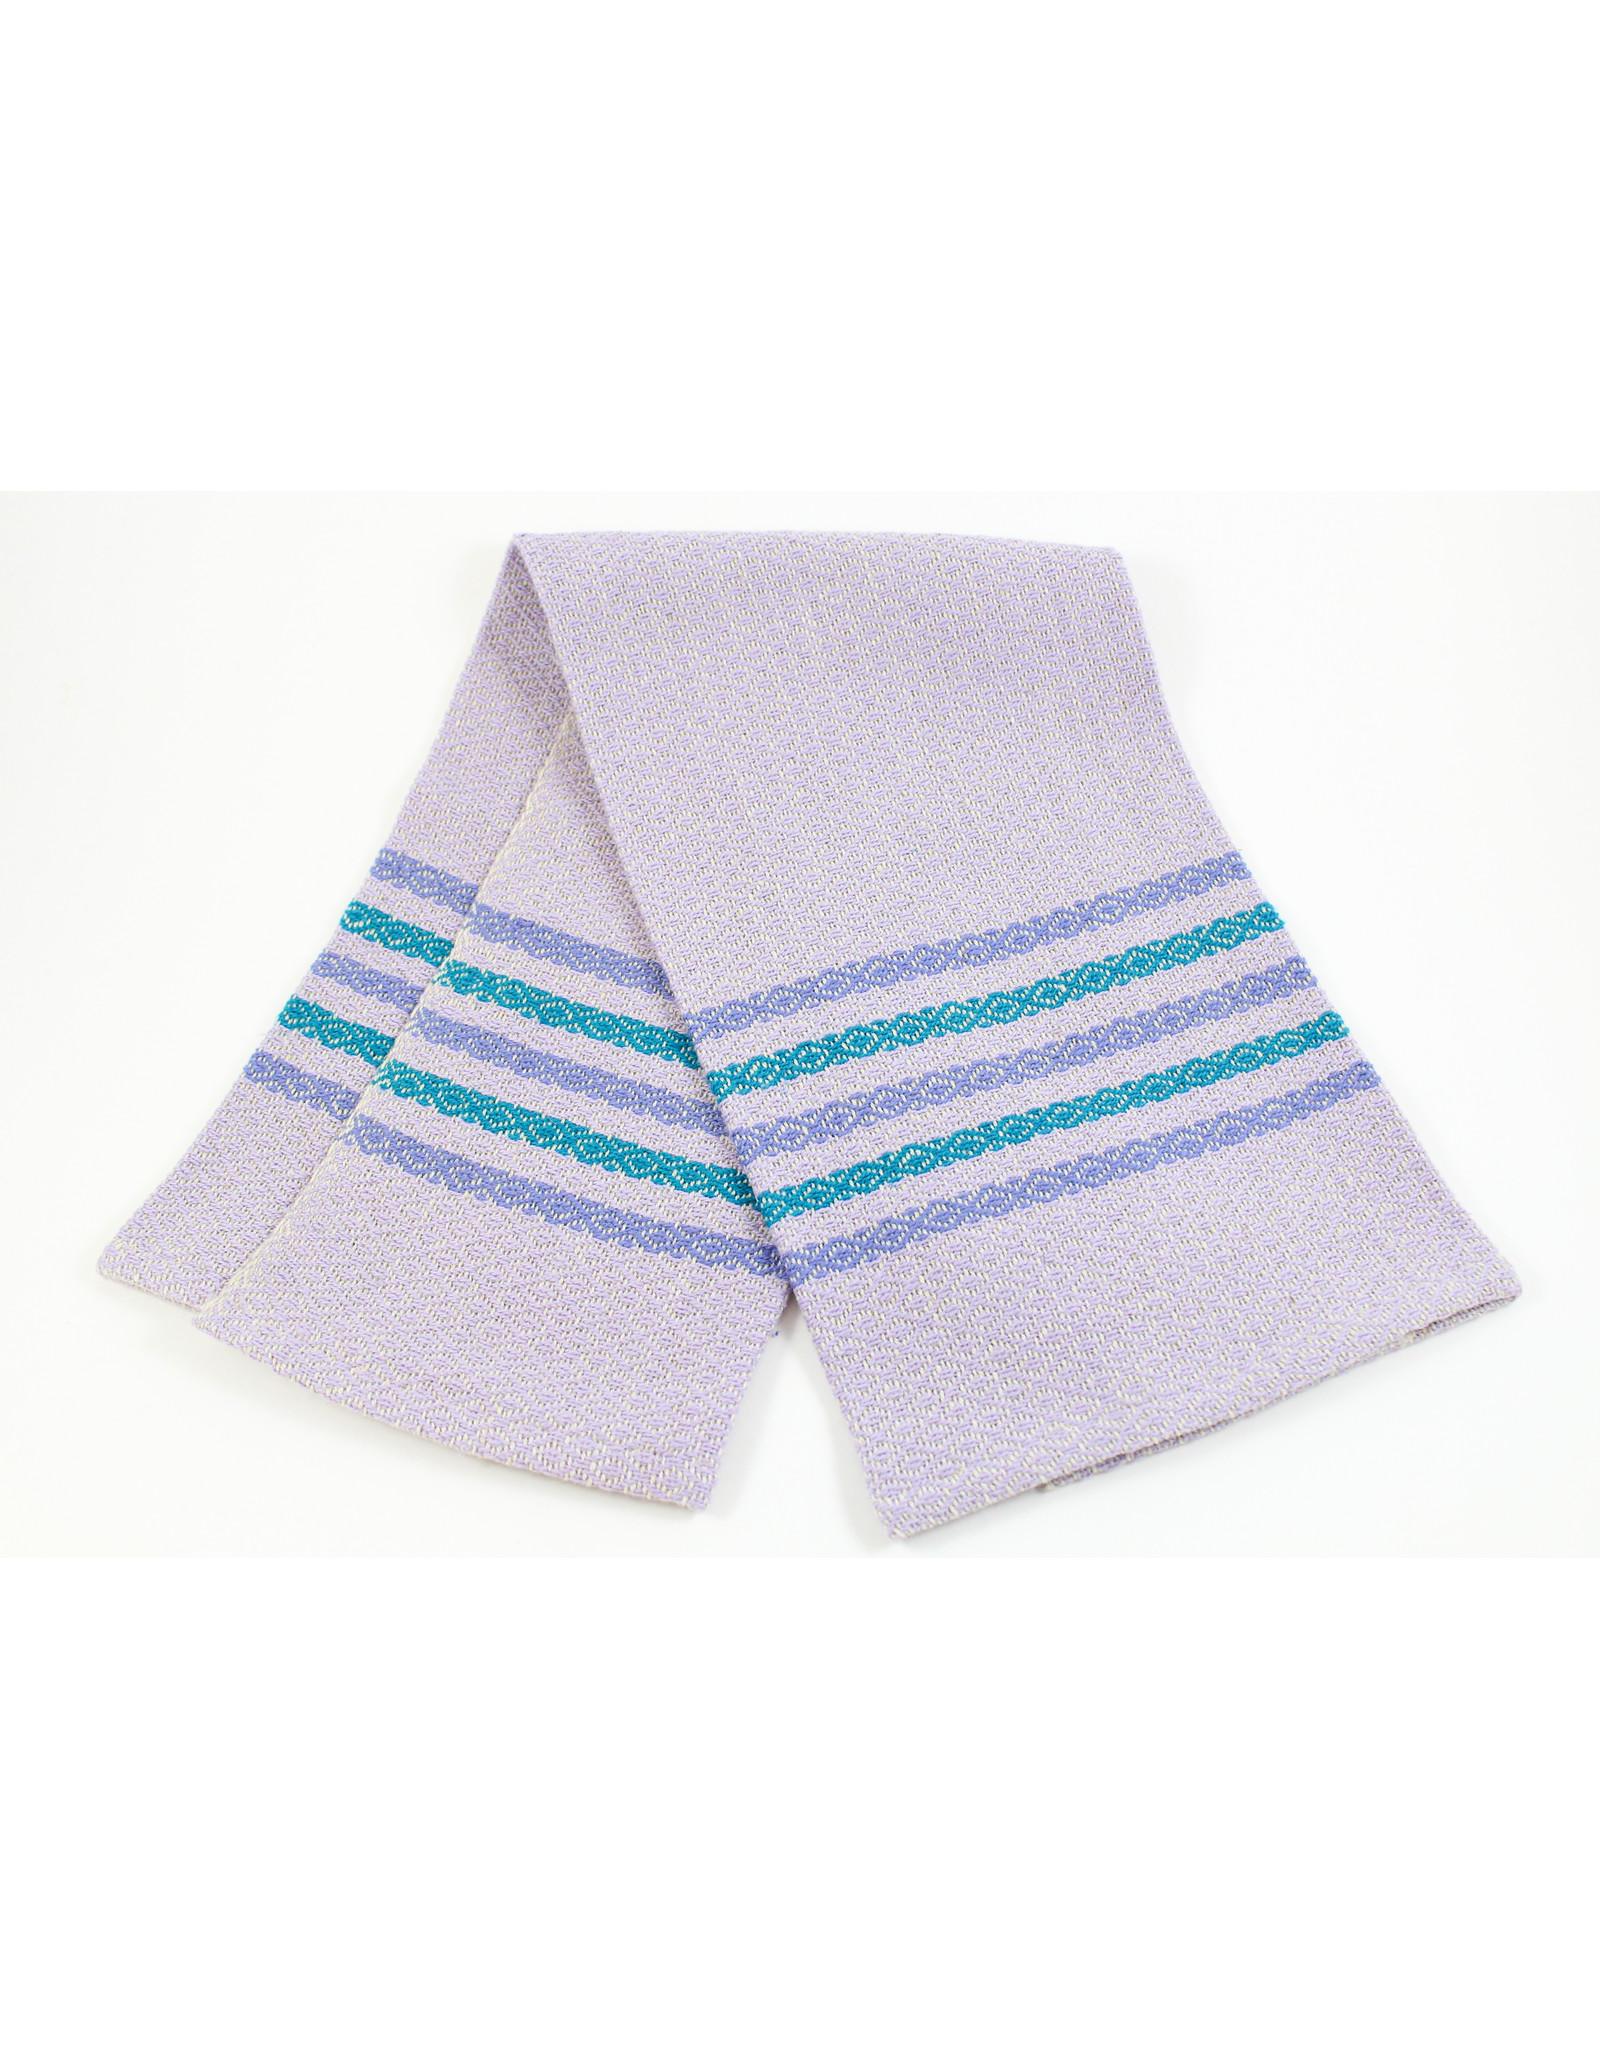 Jane Alderdice Tea Towels by Jane Alderdice